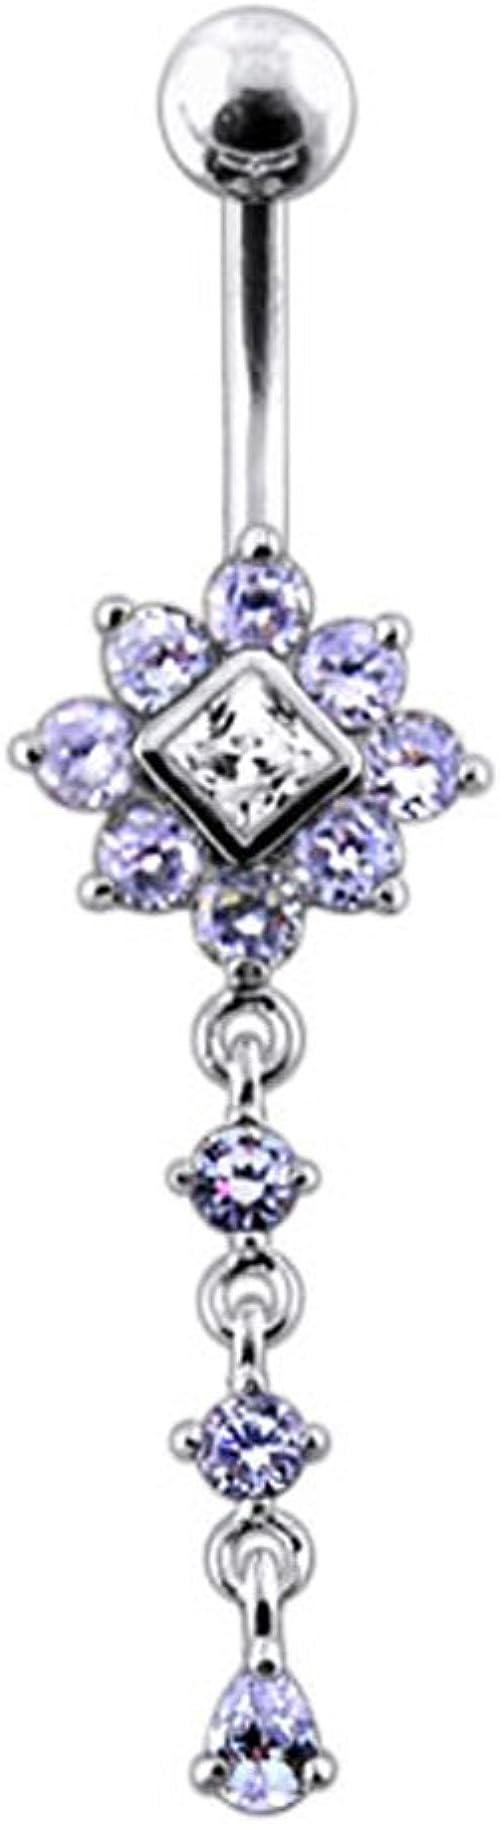 Sterling Silver /& CZ Crystal Flower Belly Bar